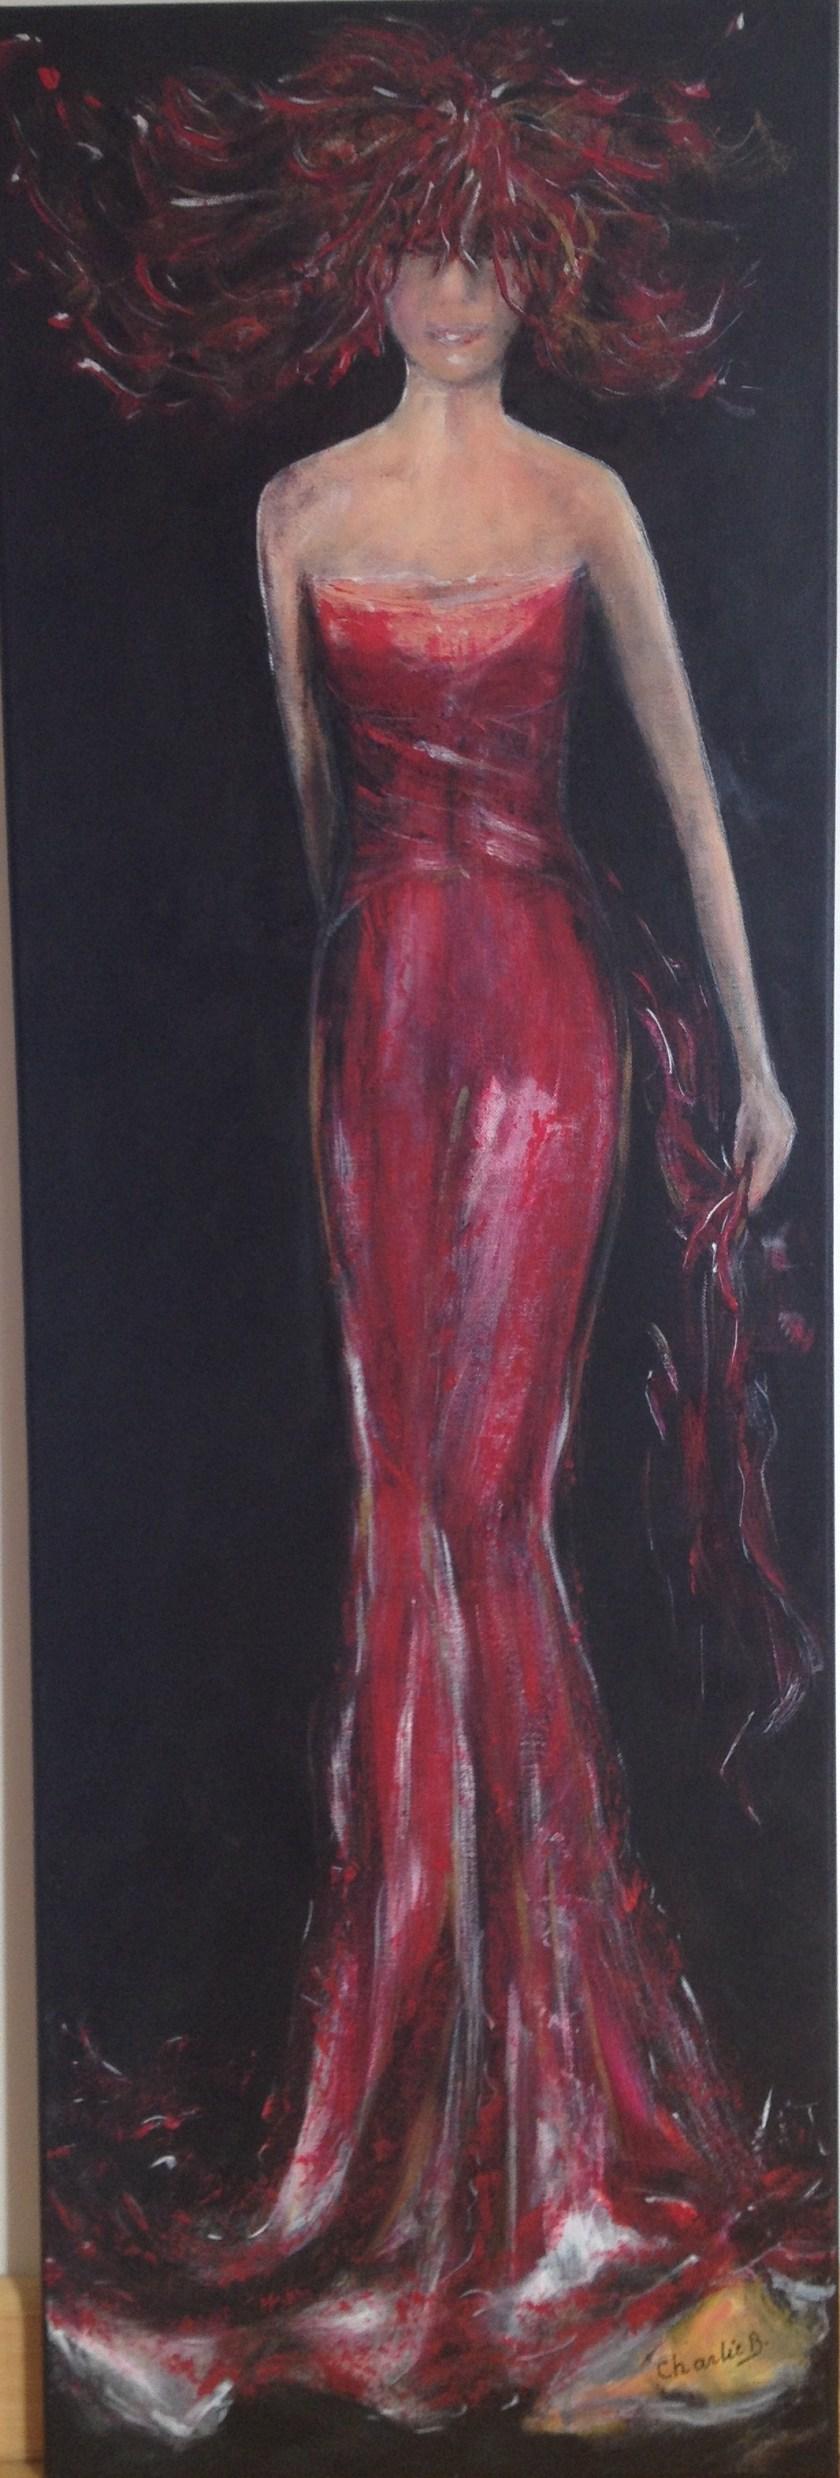 Habit rouge - acrilic toile 40x120